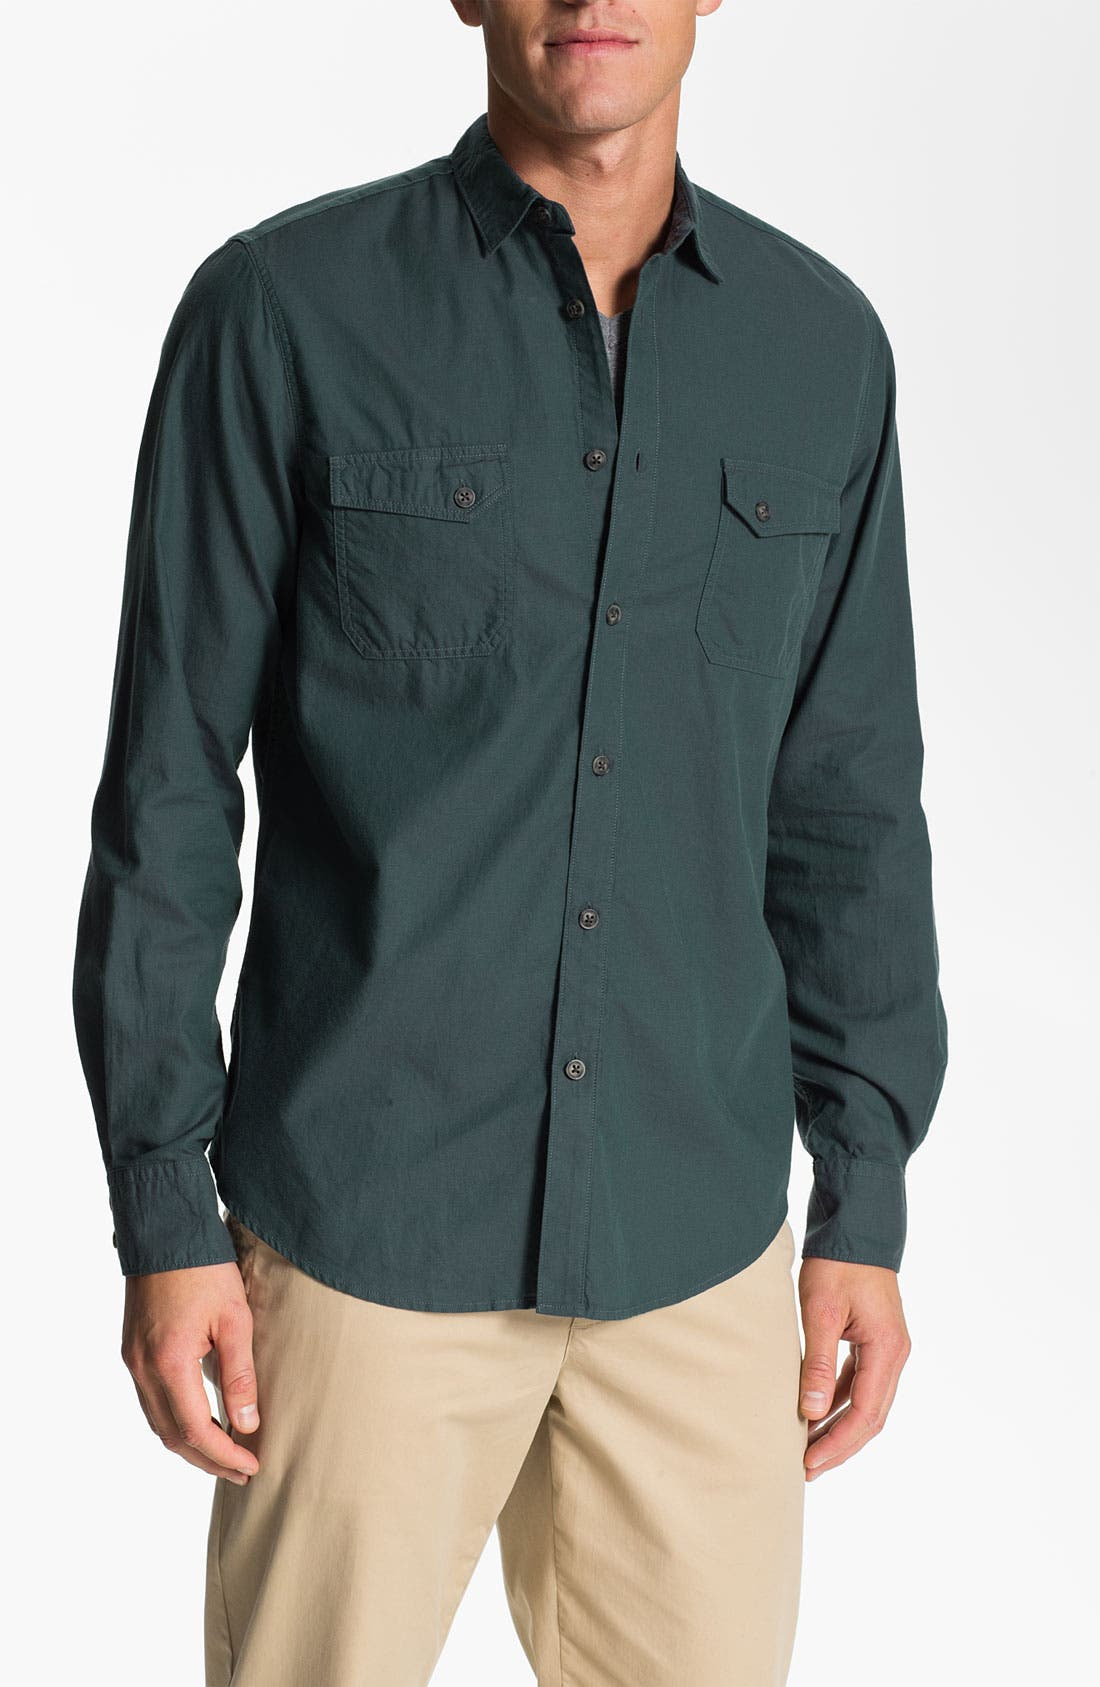 Alternate Image 1 Selected - Ben Sherman 'Shoreditch' Twill Shirt